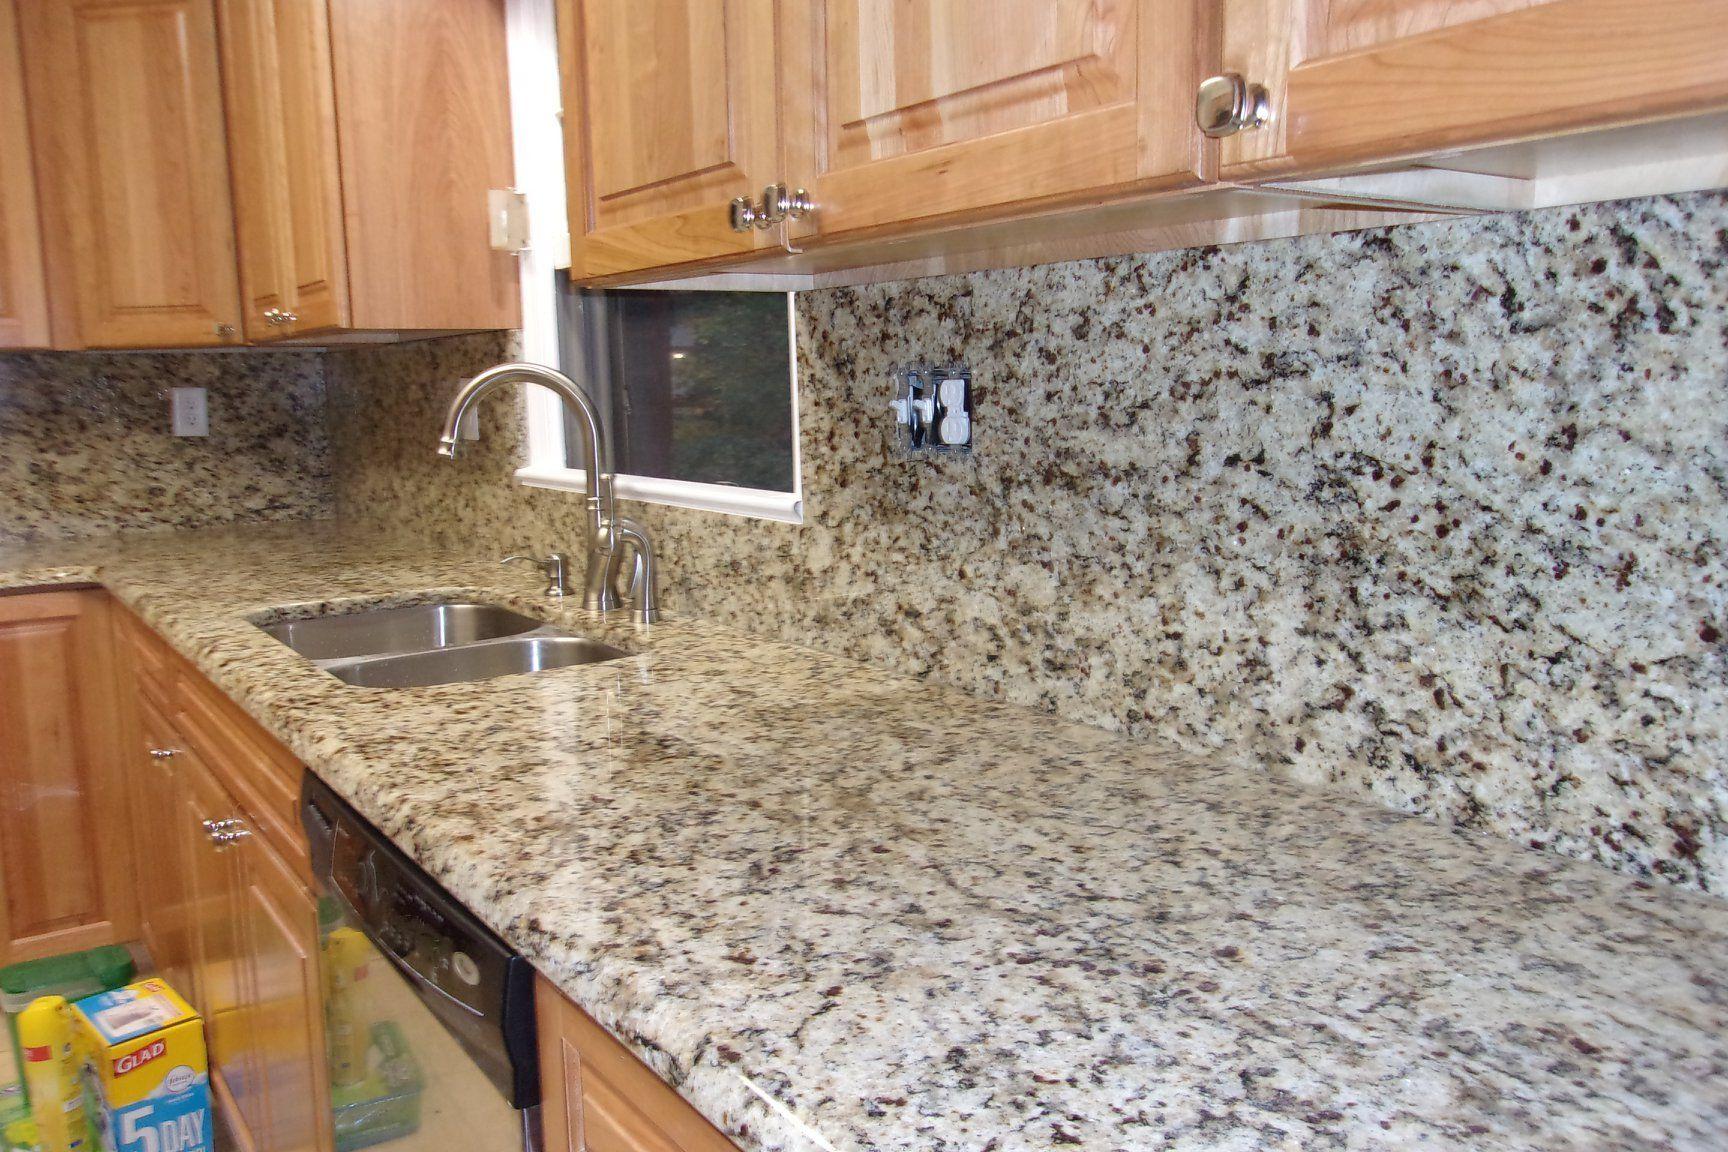 - Backsplash Ideas For Granite Countertops In Smyrna DE